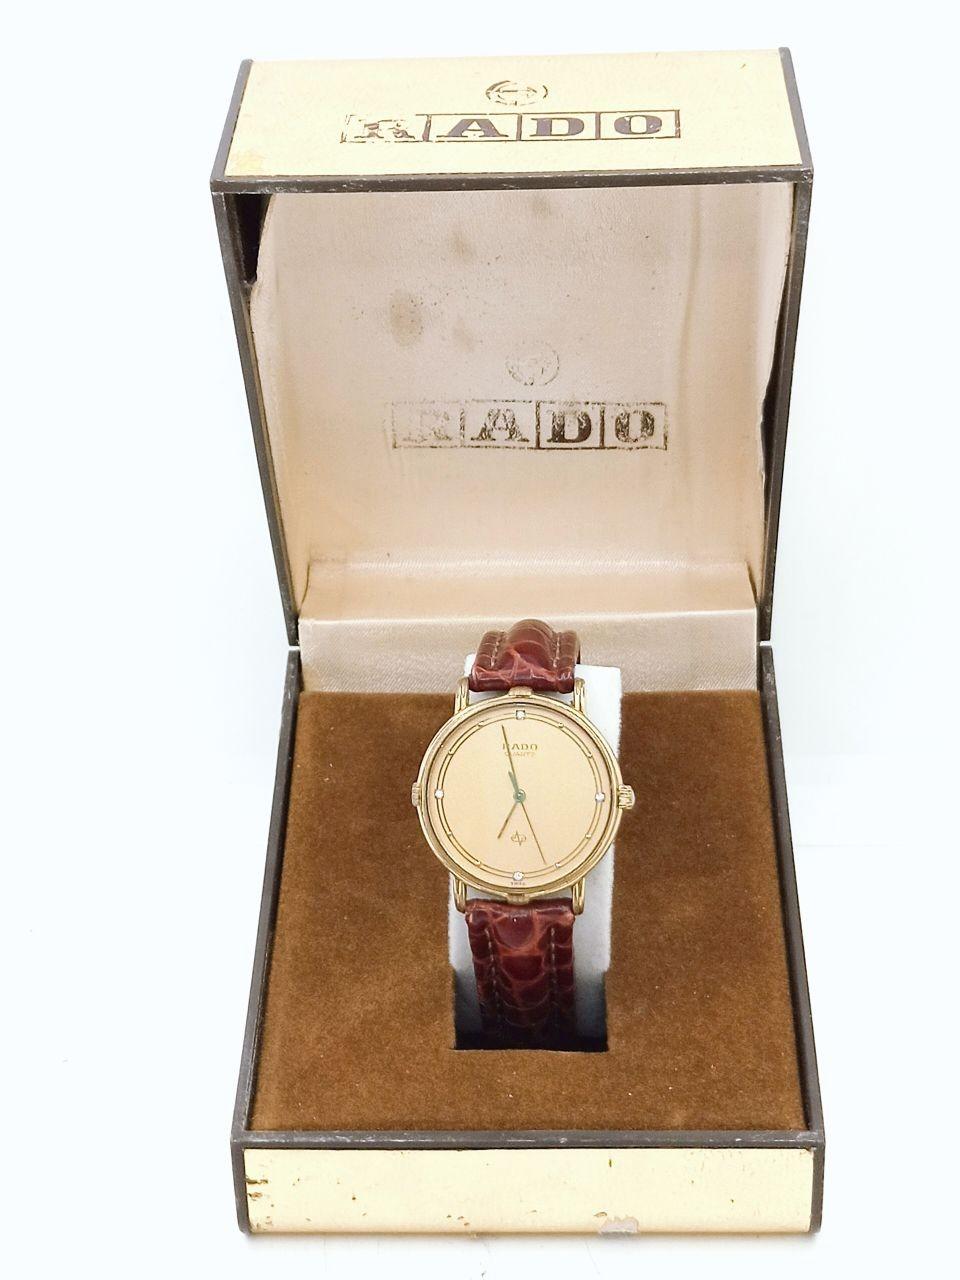 RADO 112.5161.2.8 watch